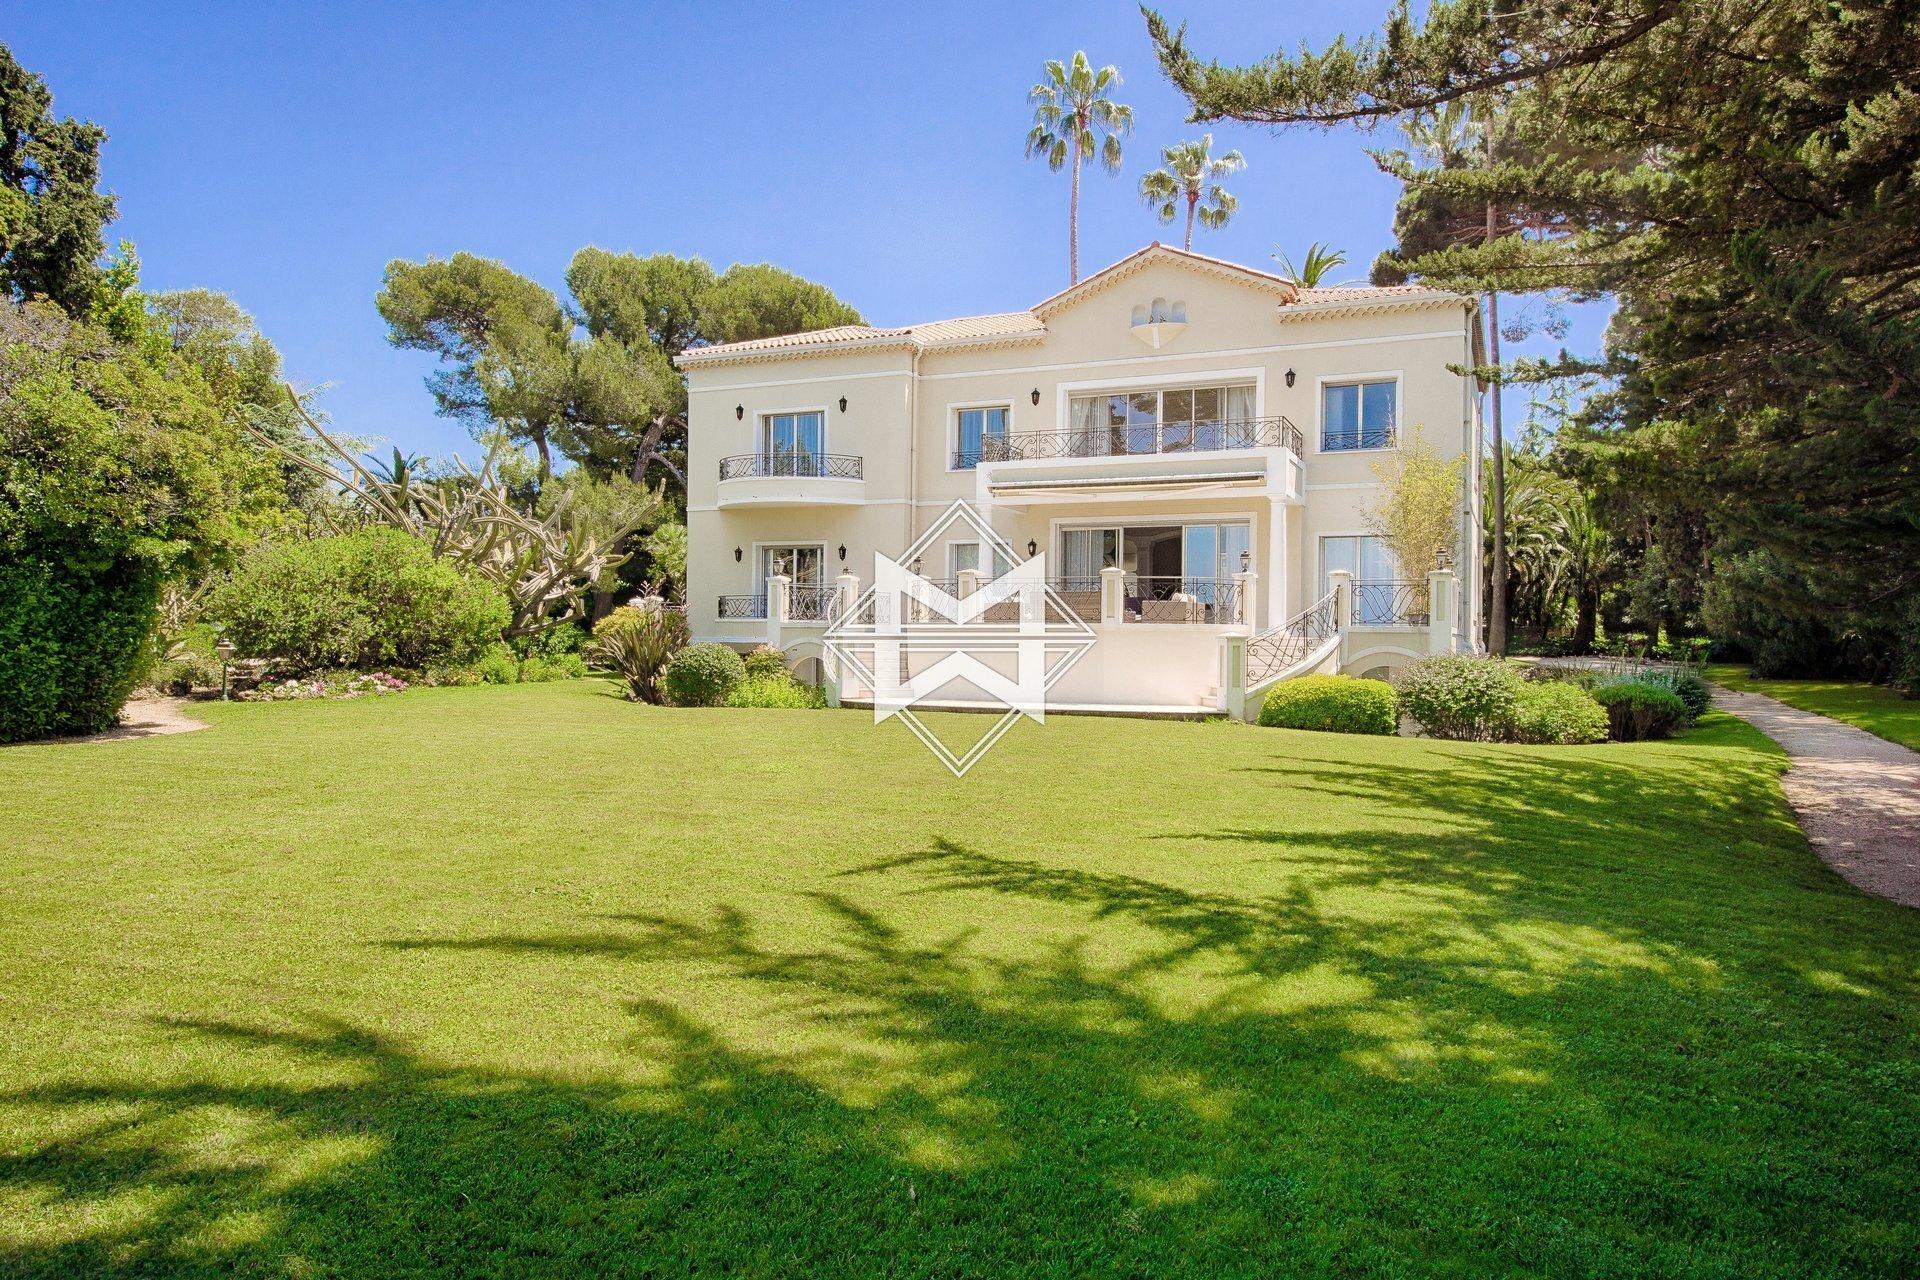 Villa in Antibes, Provence-Alpes-Côte d'Azur, France 1 - 10839492